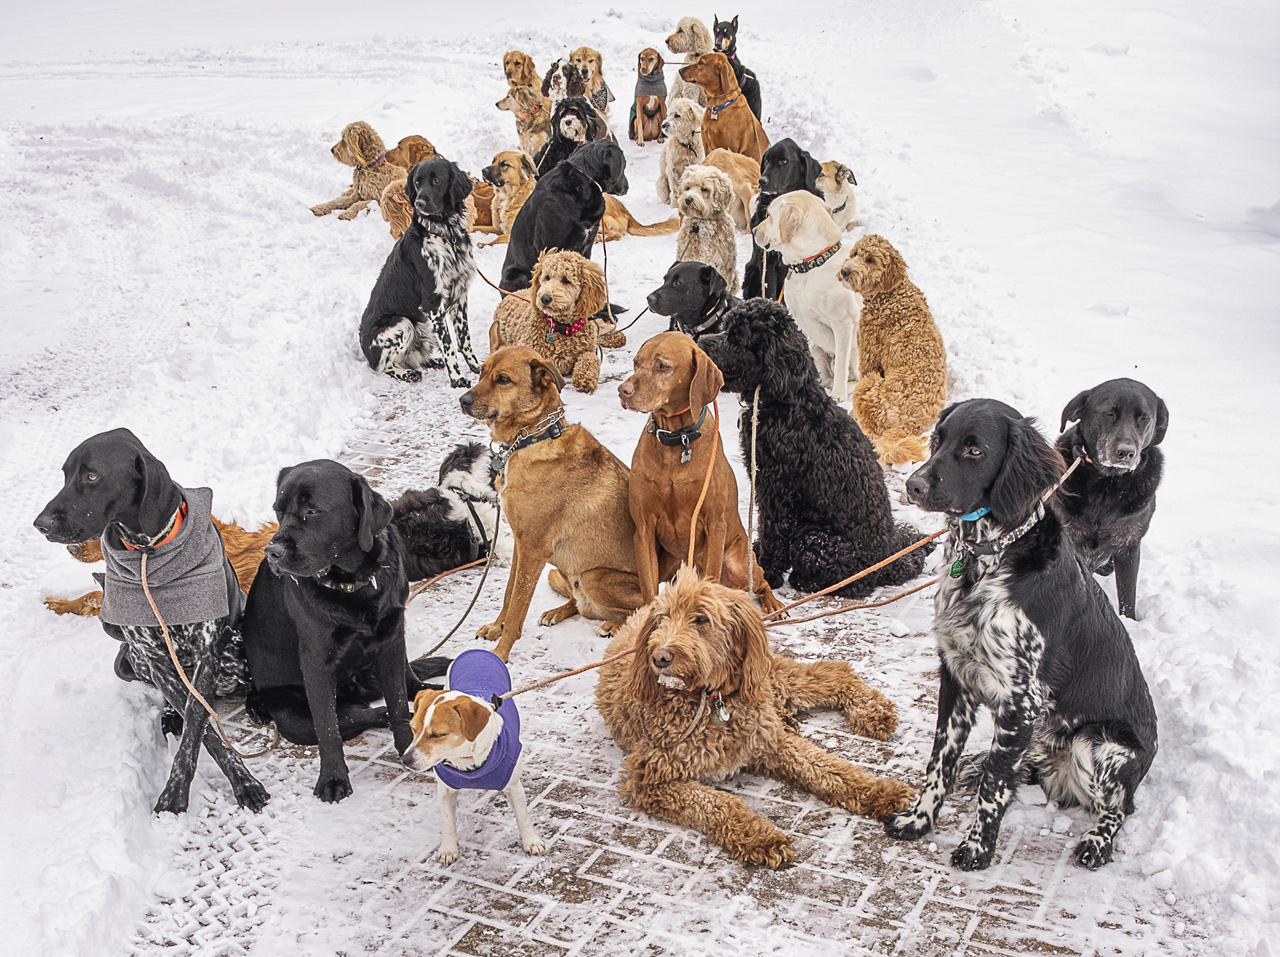 How Many Dogs - Paul Stearns - MCC